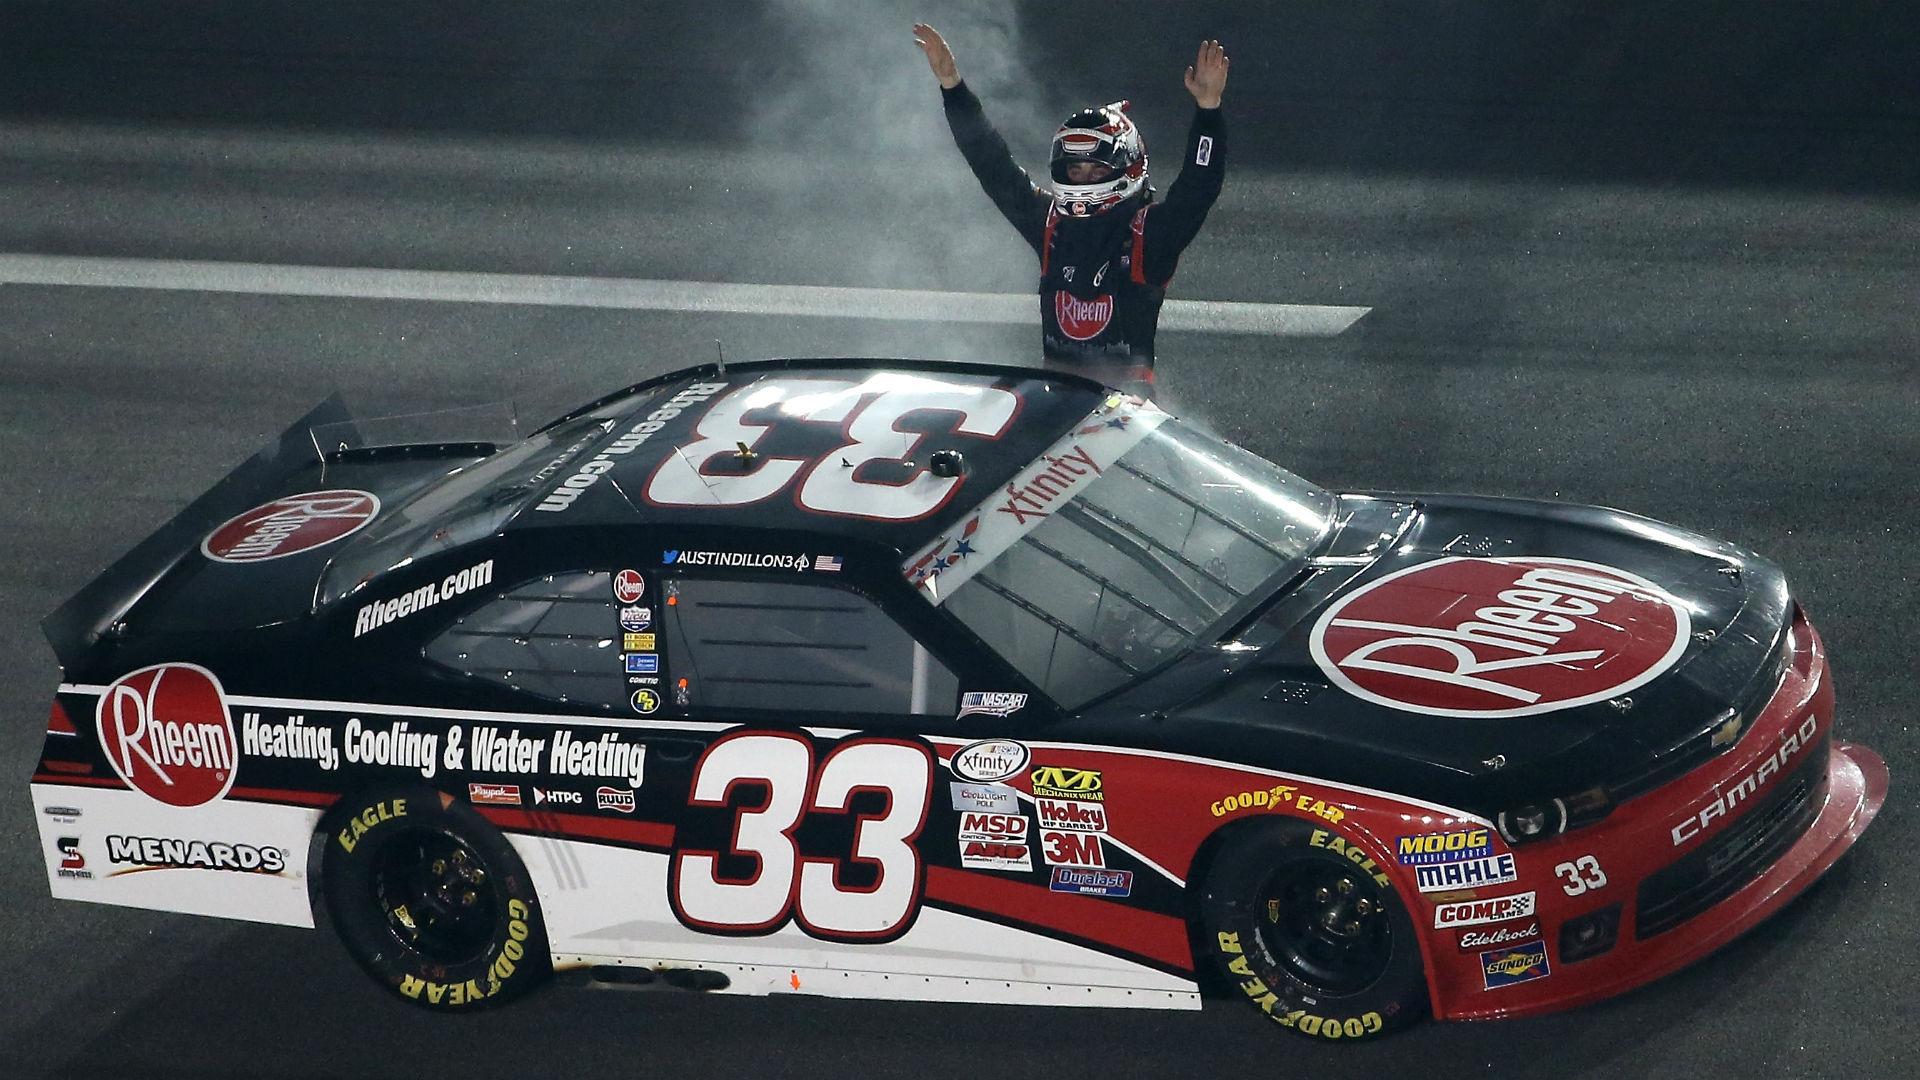 Austin Dillon outlasts Chase Elliott to win Subway Firecracker 250